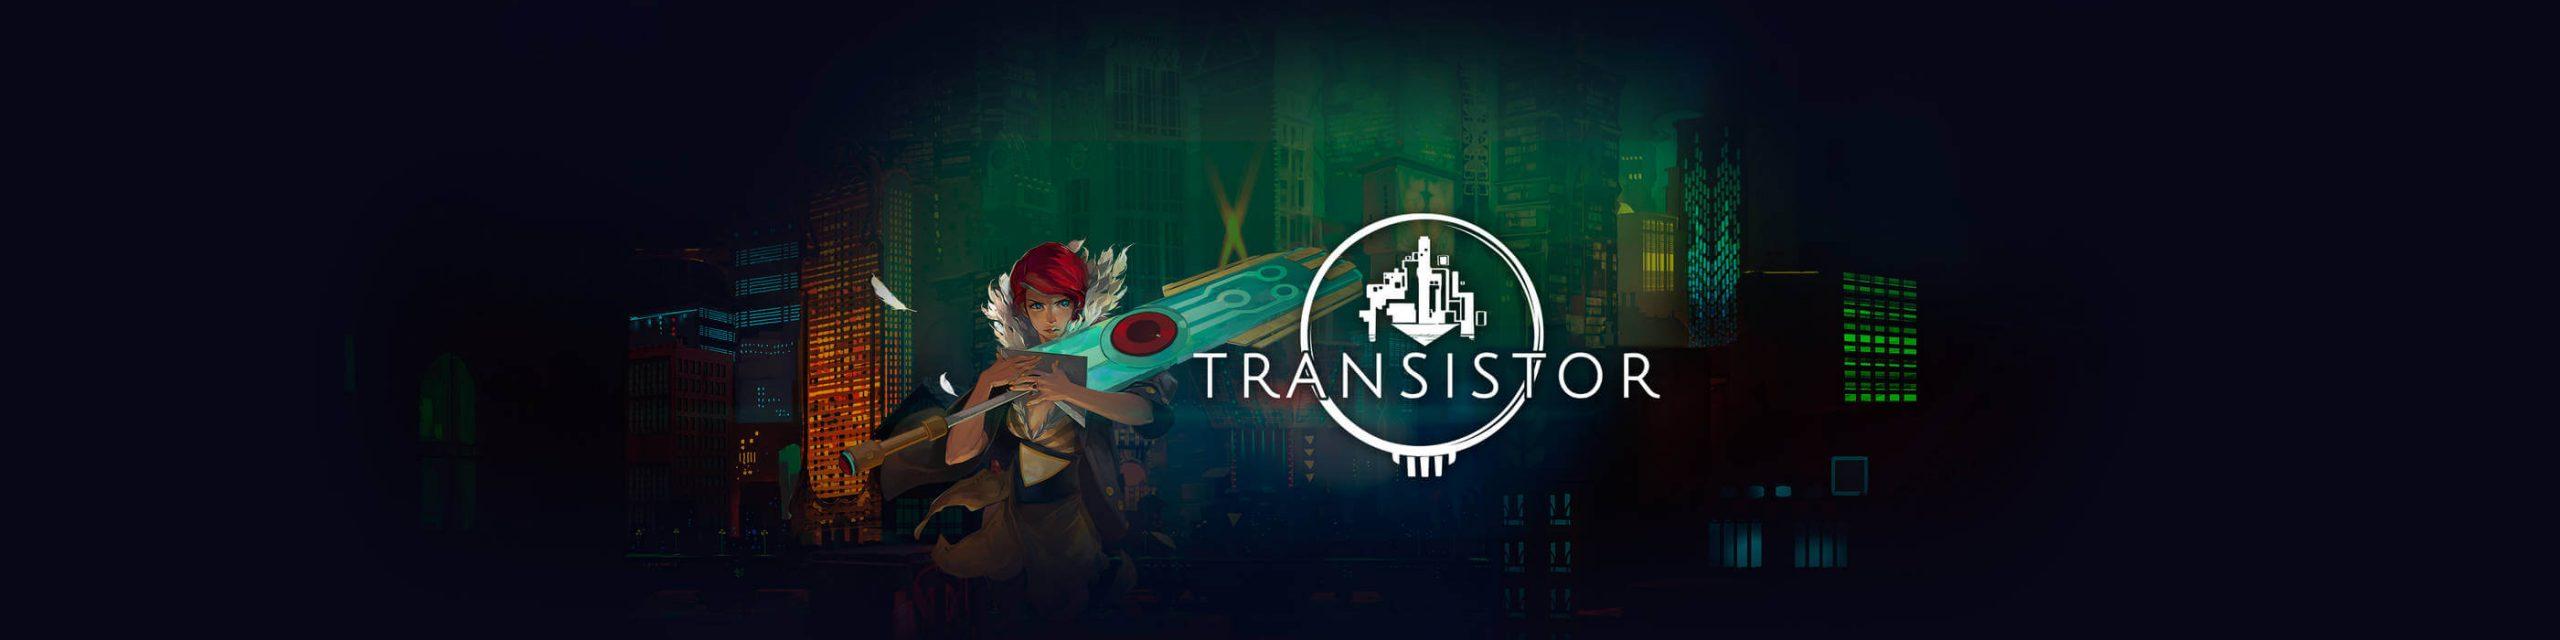 [已购]Transistor-草蜢资源